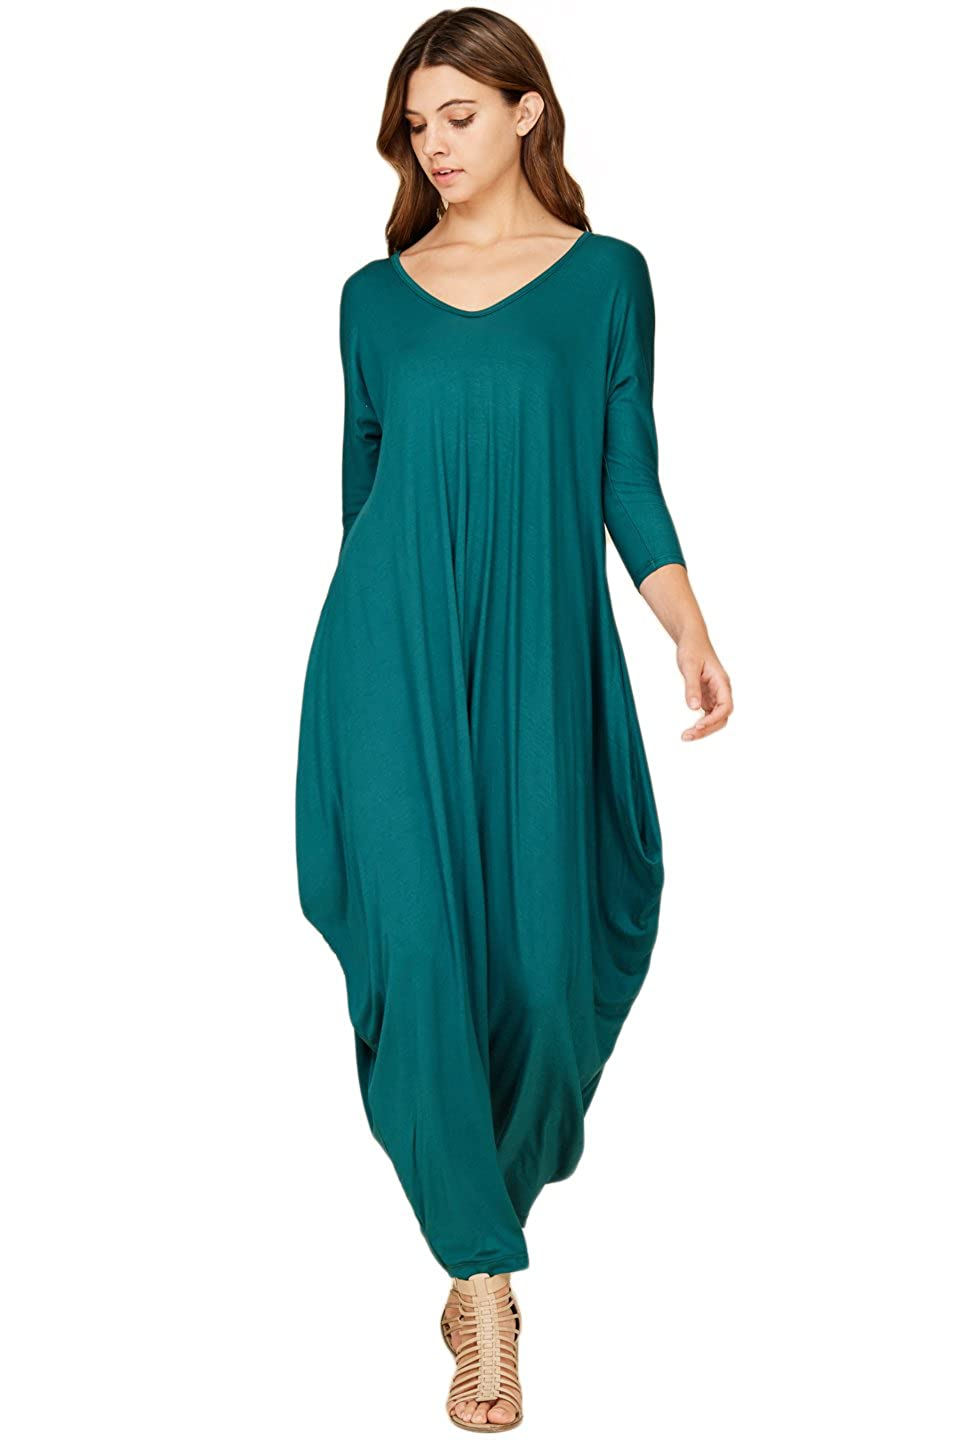 Annabelle Women's Solid Harem Pant Long Sleeve Pocket Harem Pant Jumpsuit